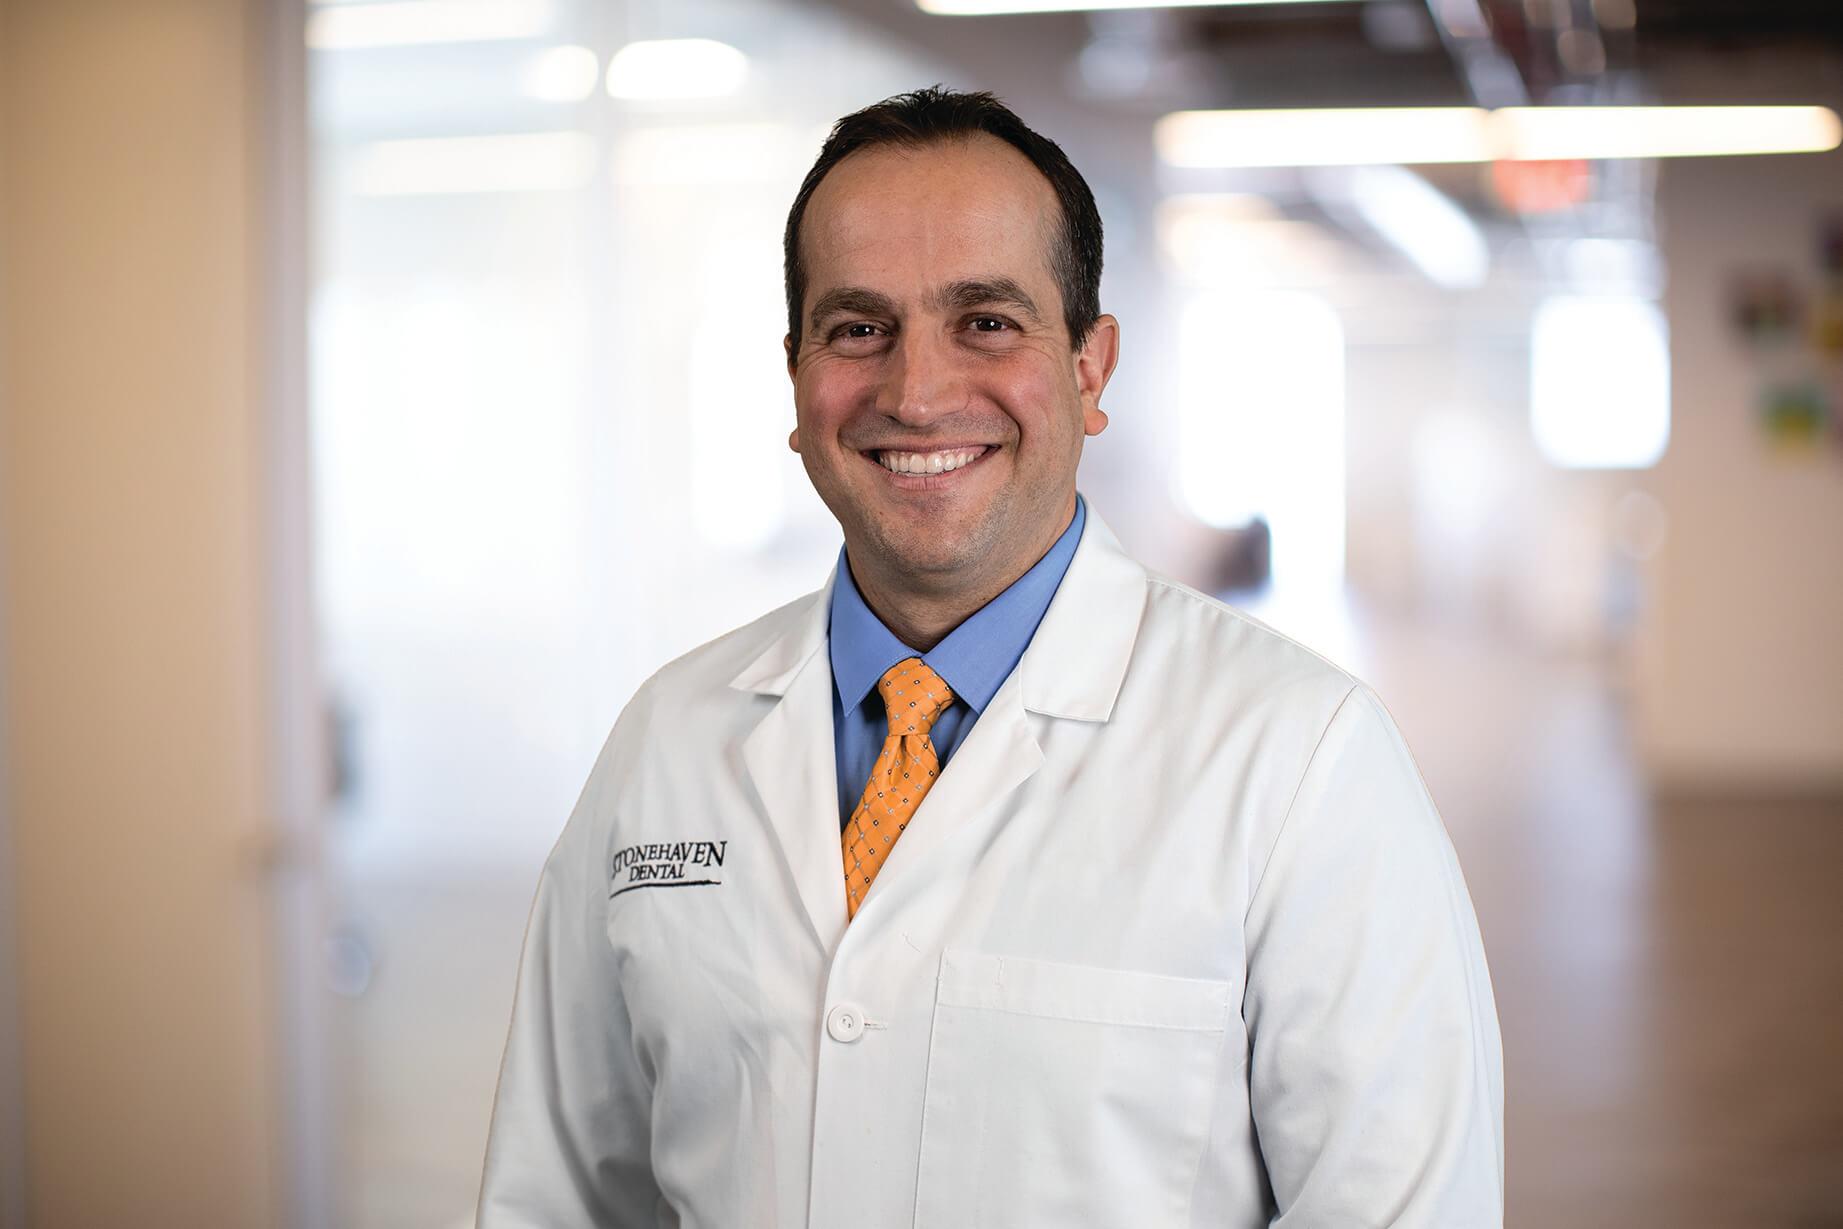 Dr. Tyson Perrero